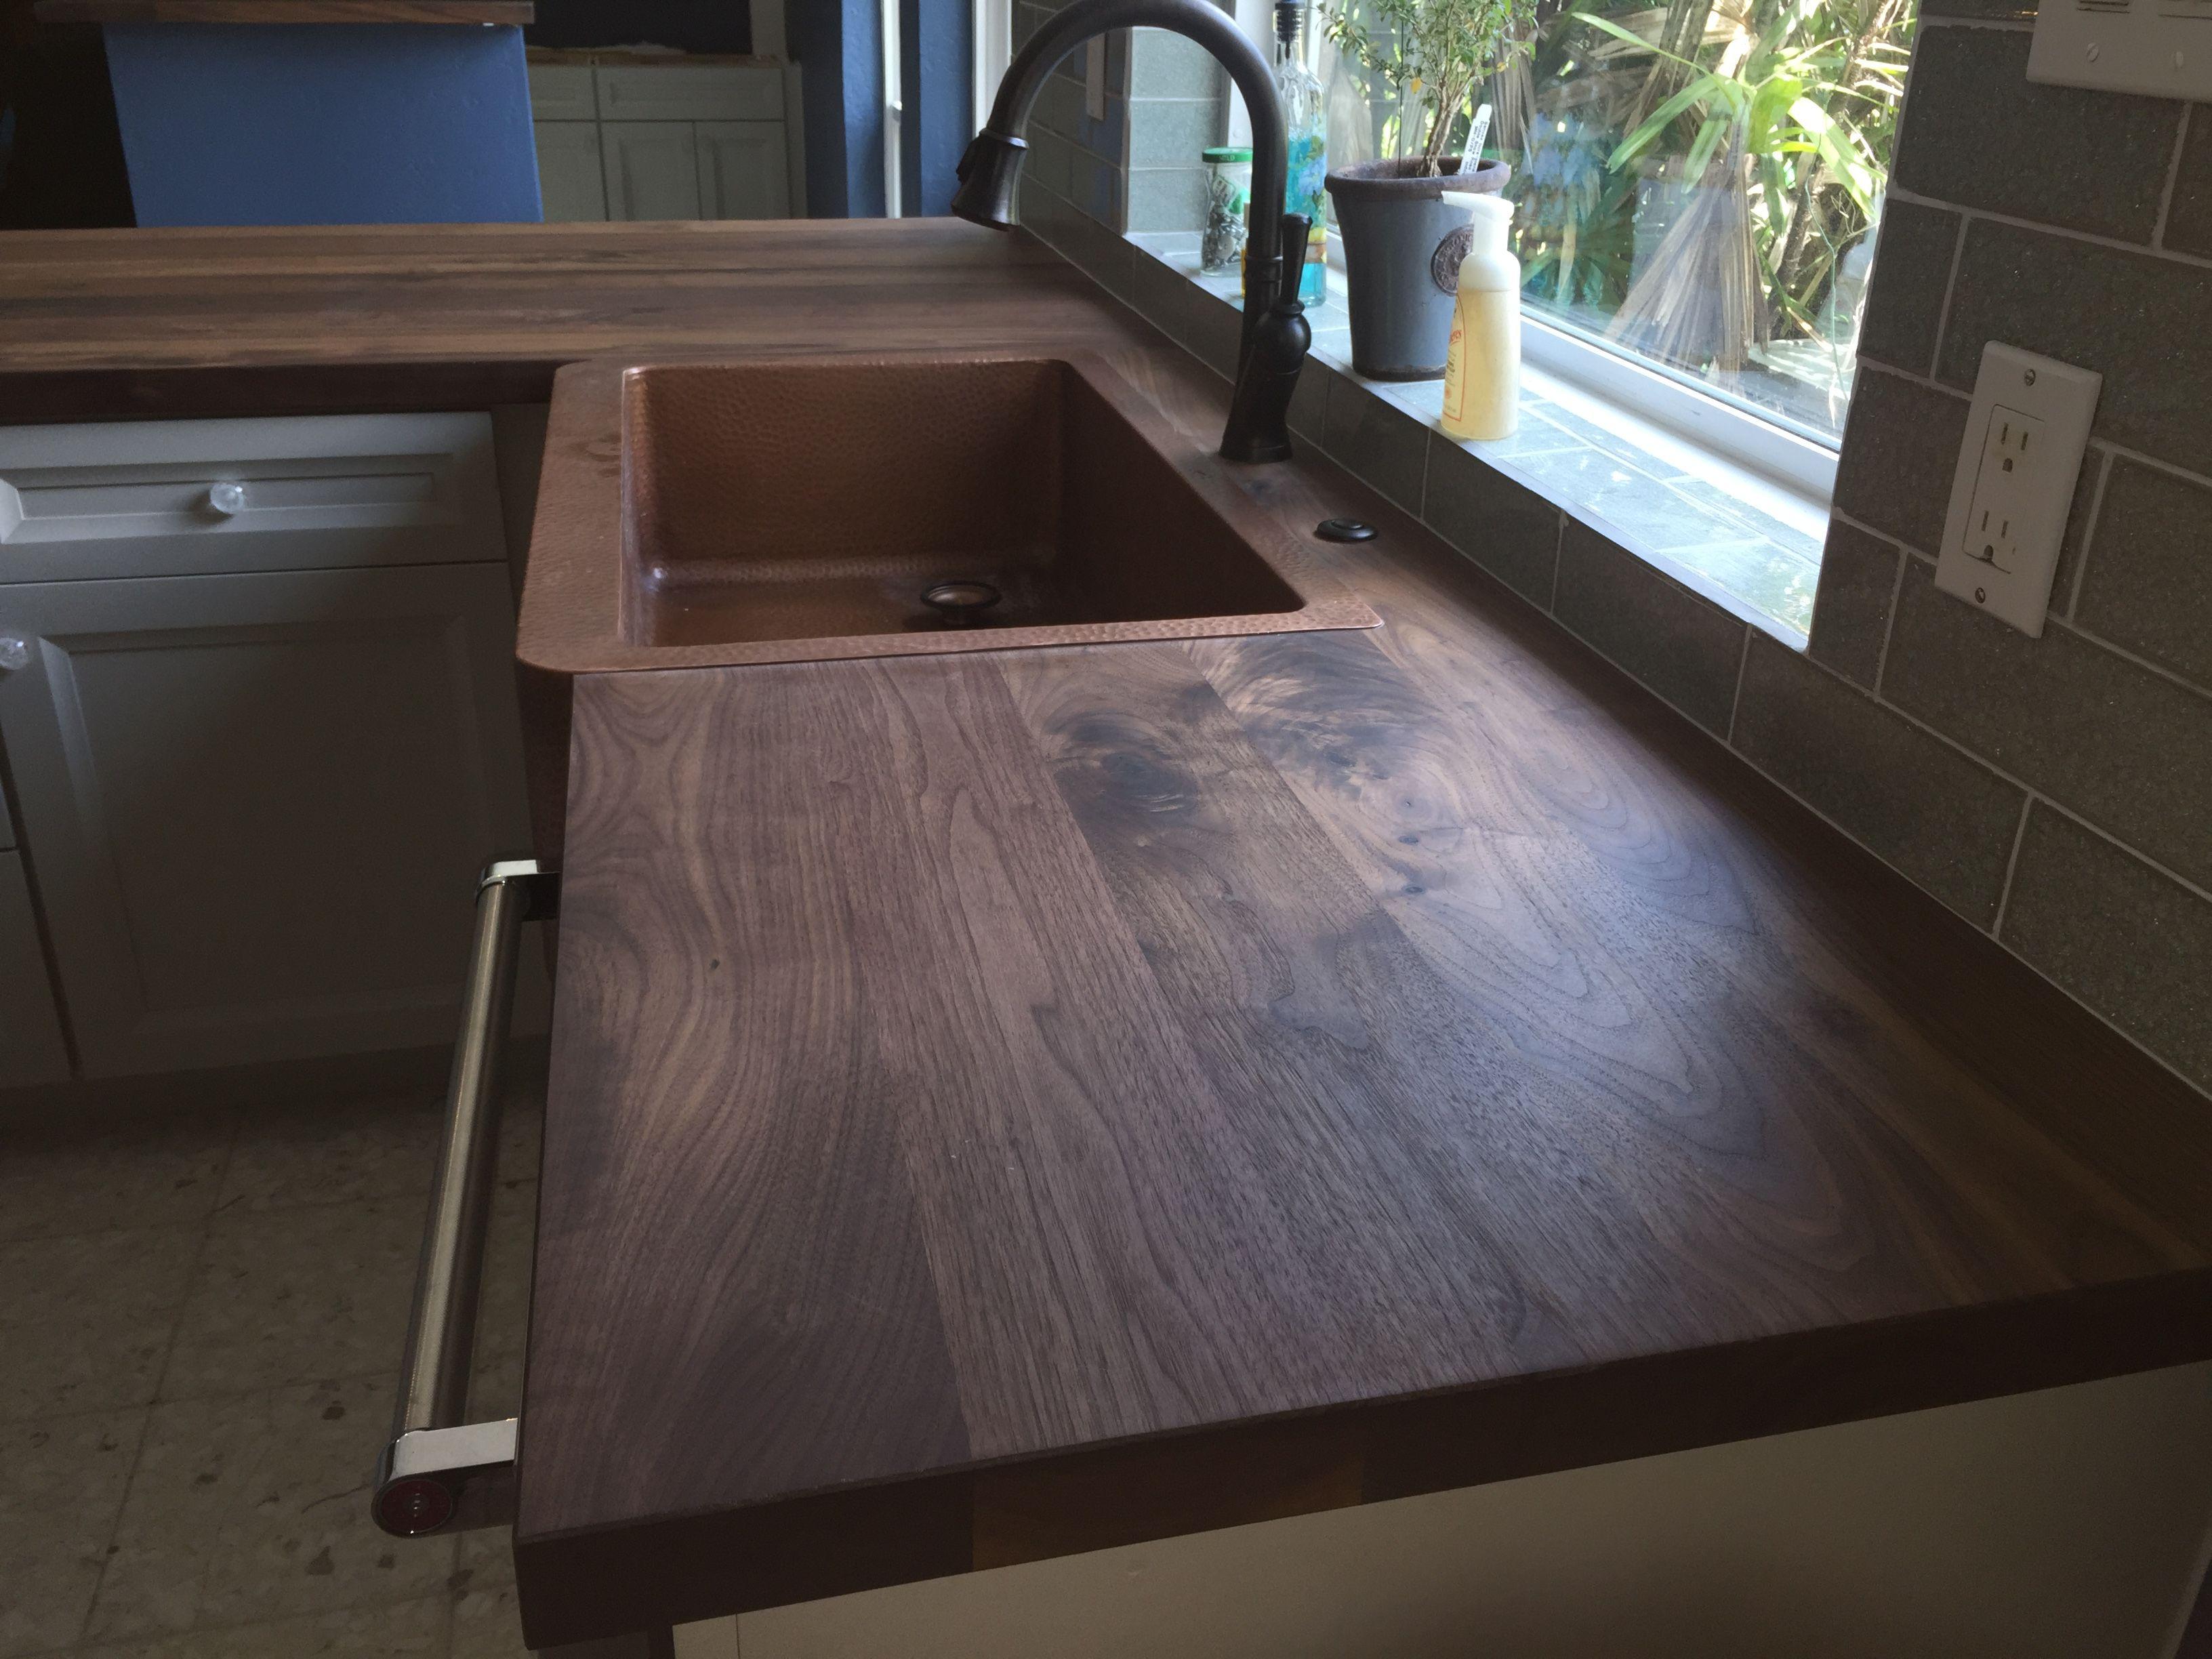 Walnut Face Grain Countertop With Copper Sink Copper Kitchen